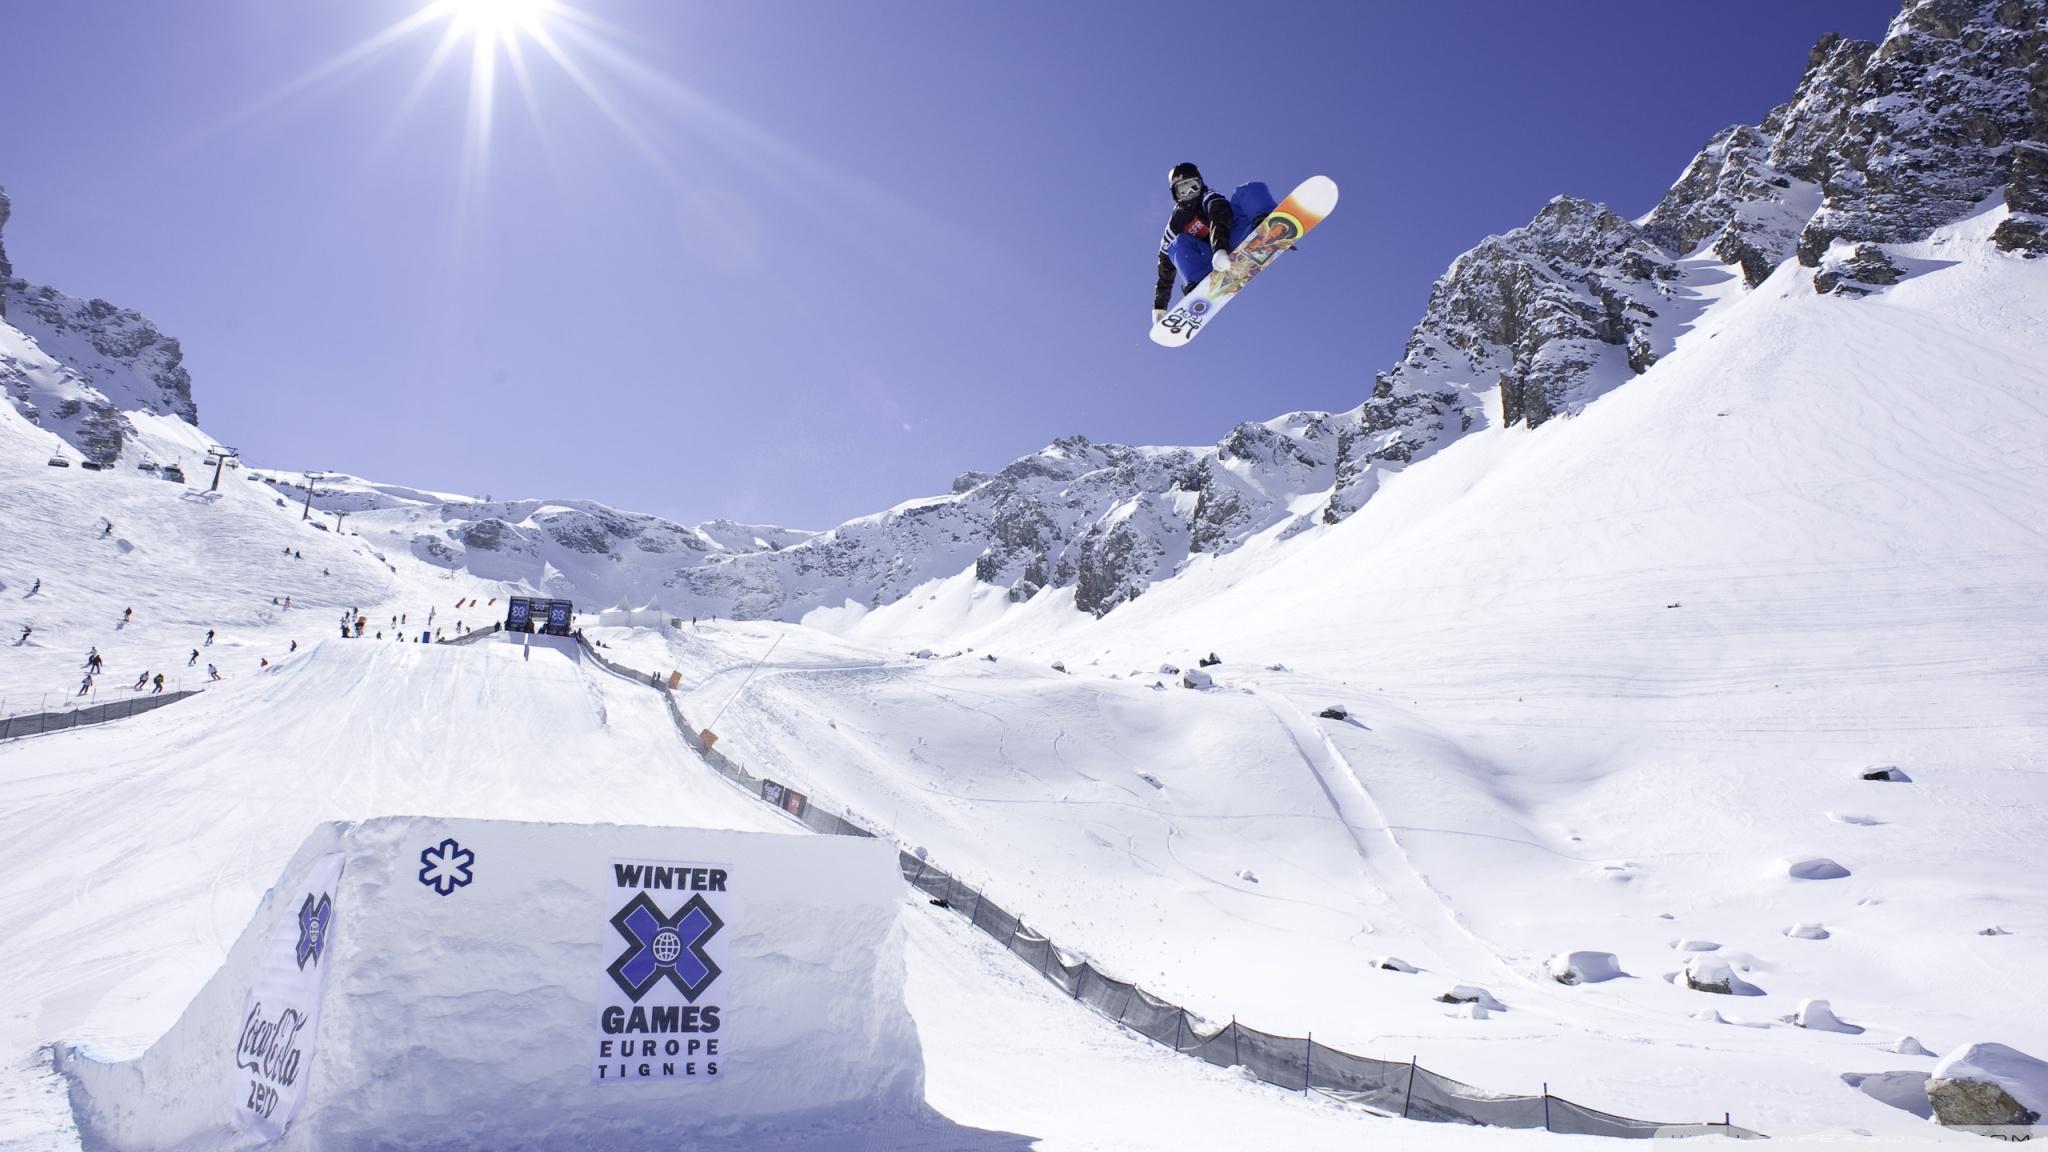 Winter Games Europe Tignes 4K HD Desktop Wallpaper for 4K Ultra 2048x1152